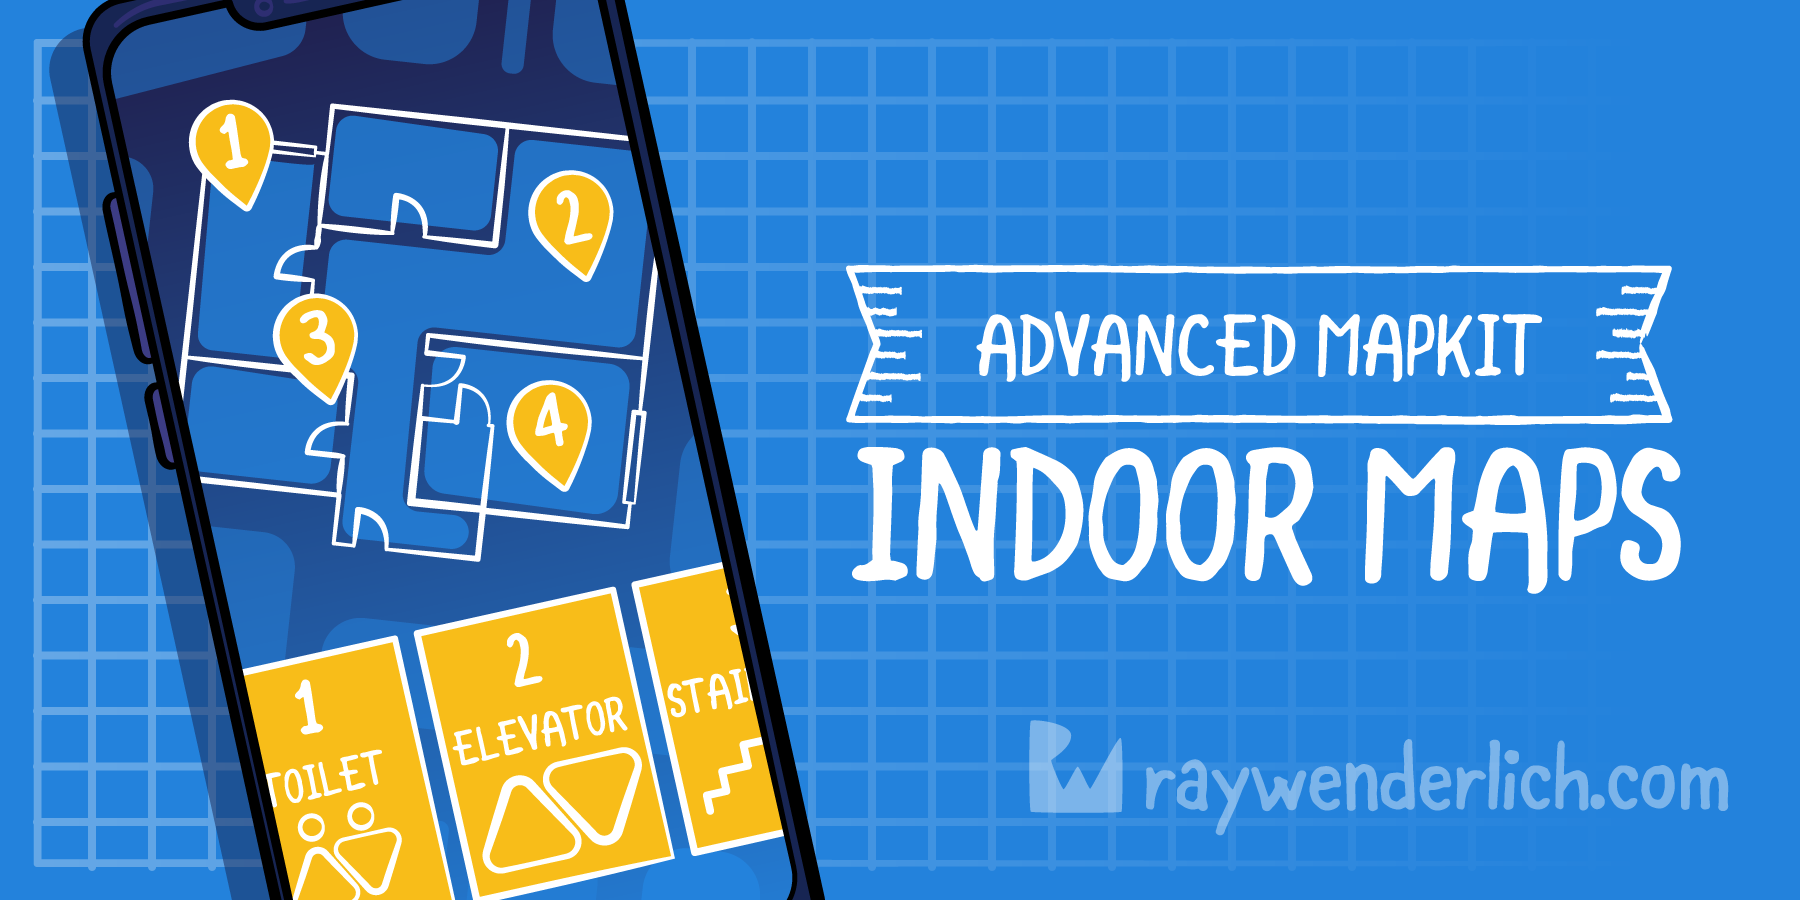 Indoor Maps on iOS: Advanced MapKit [FREE]